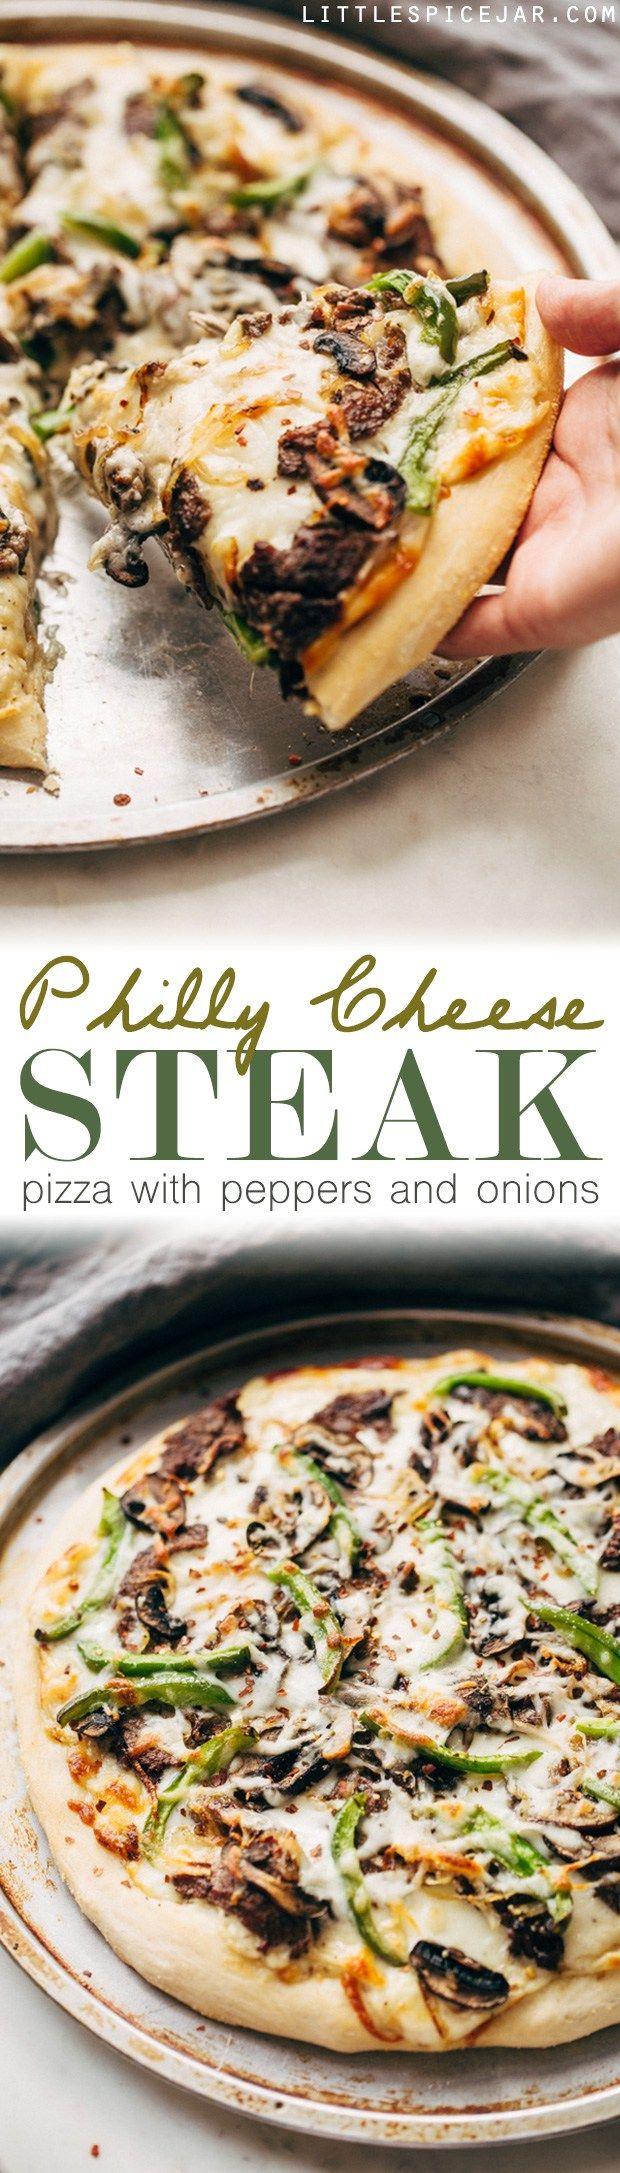 Good recipes for your family | pizza recipes dough • pizza recipes homemade • pizza recipes for kids • pizza recipes healthy • pizza recipes easy • seafood pizza recipes • pepperoni pizza recipes • chicken, grilled, margarita, dessert, mushroom pizza recipes ➥ healthydish.club